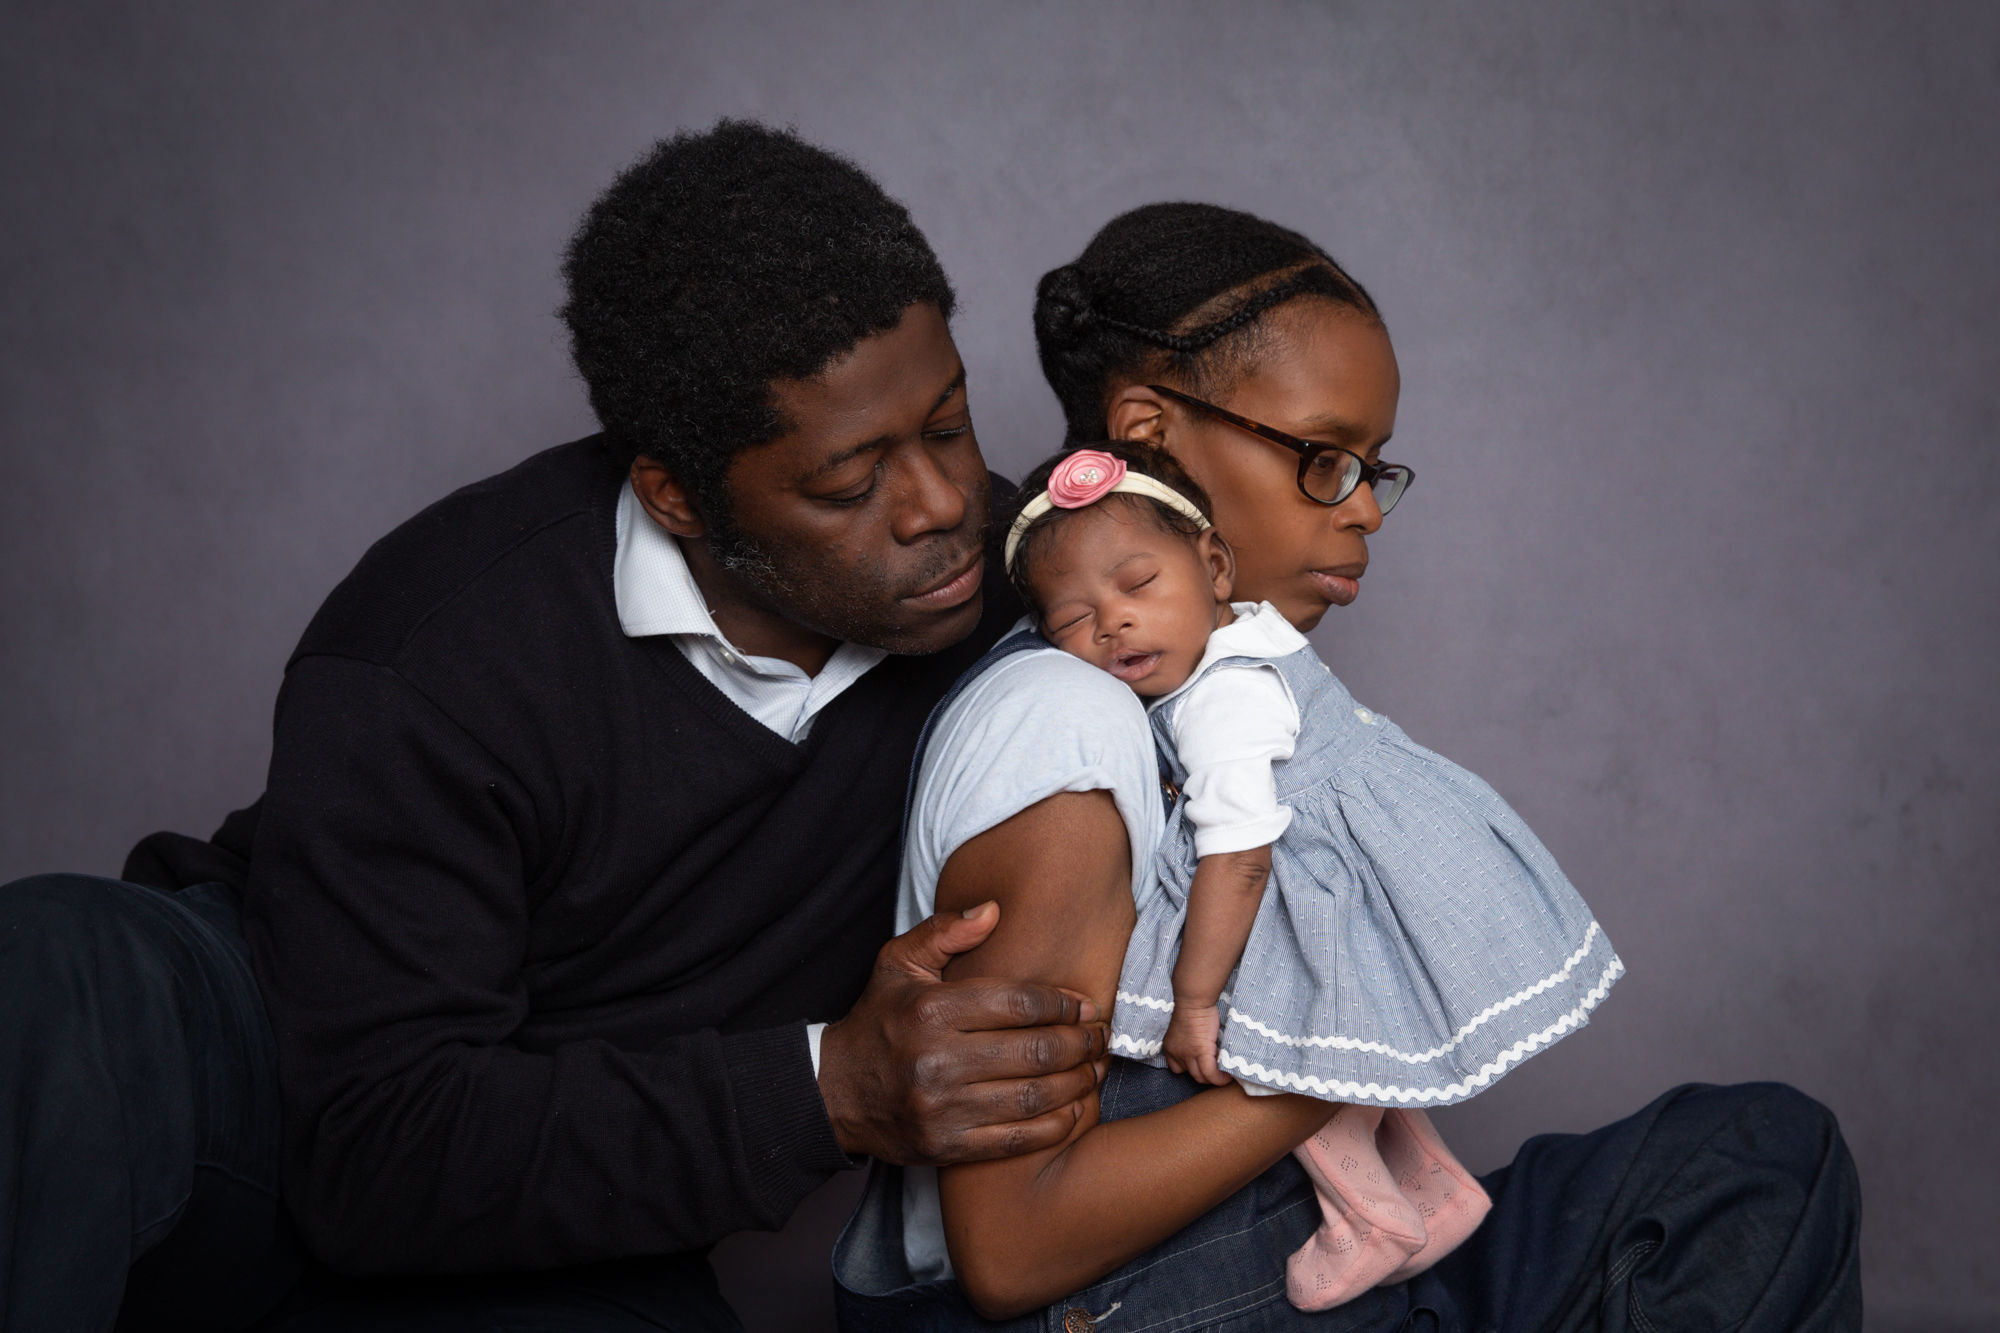 Dulwich newborn & family photography, London